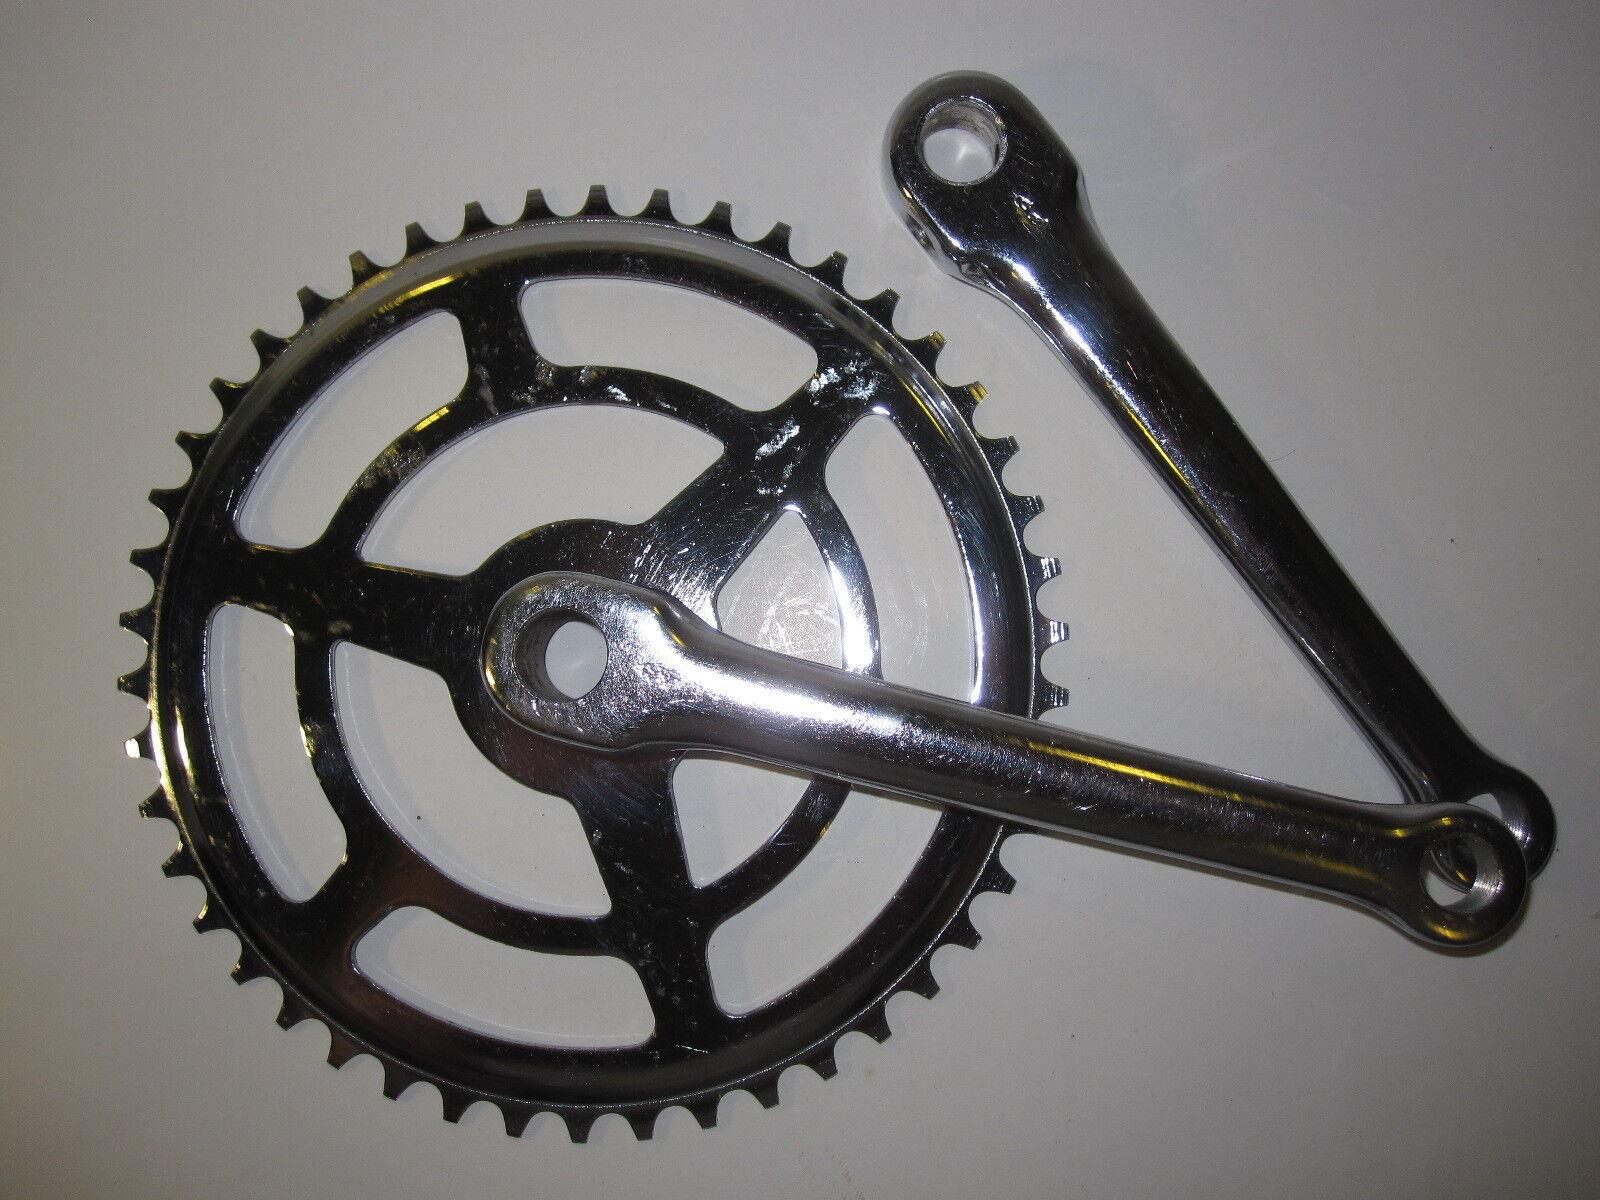 Vintage Raleigh Cottered  Crank & Chainwheel Set  online shopping